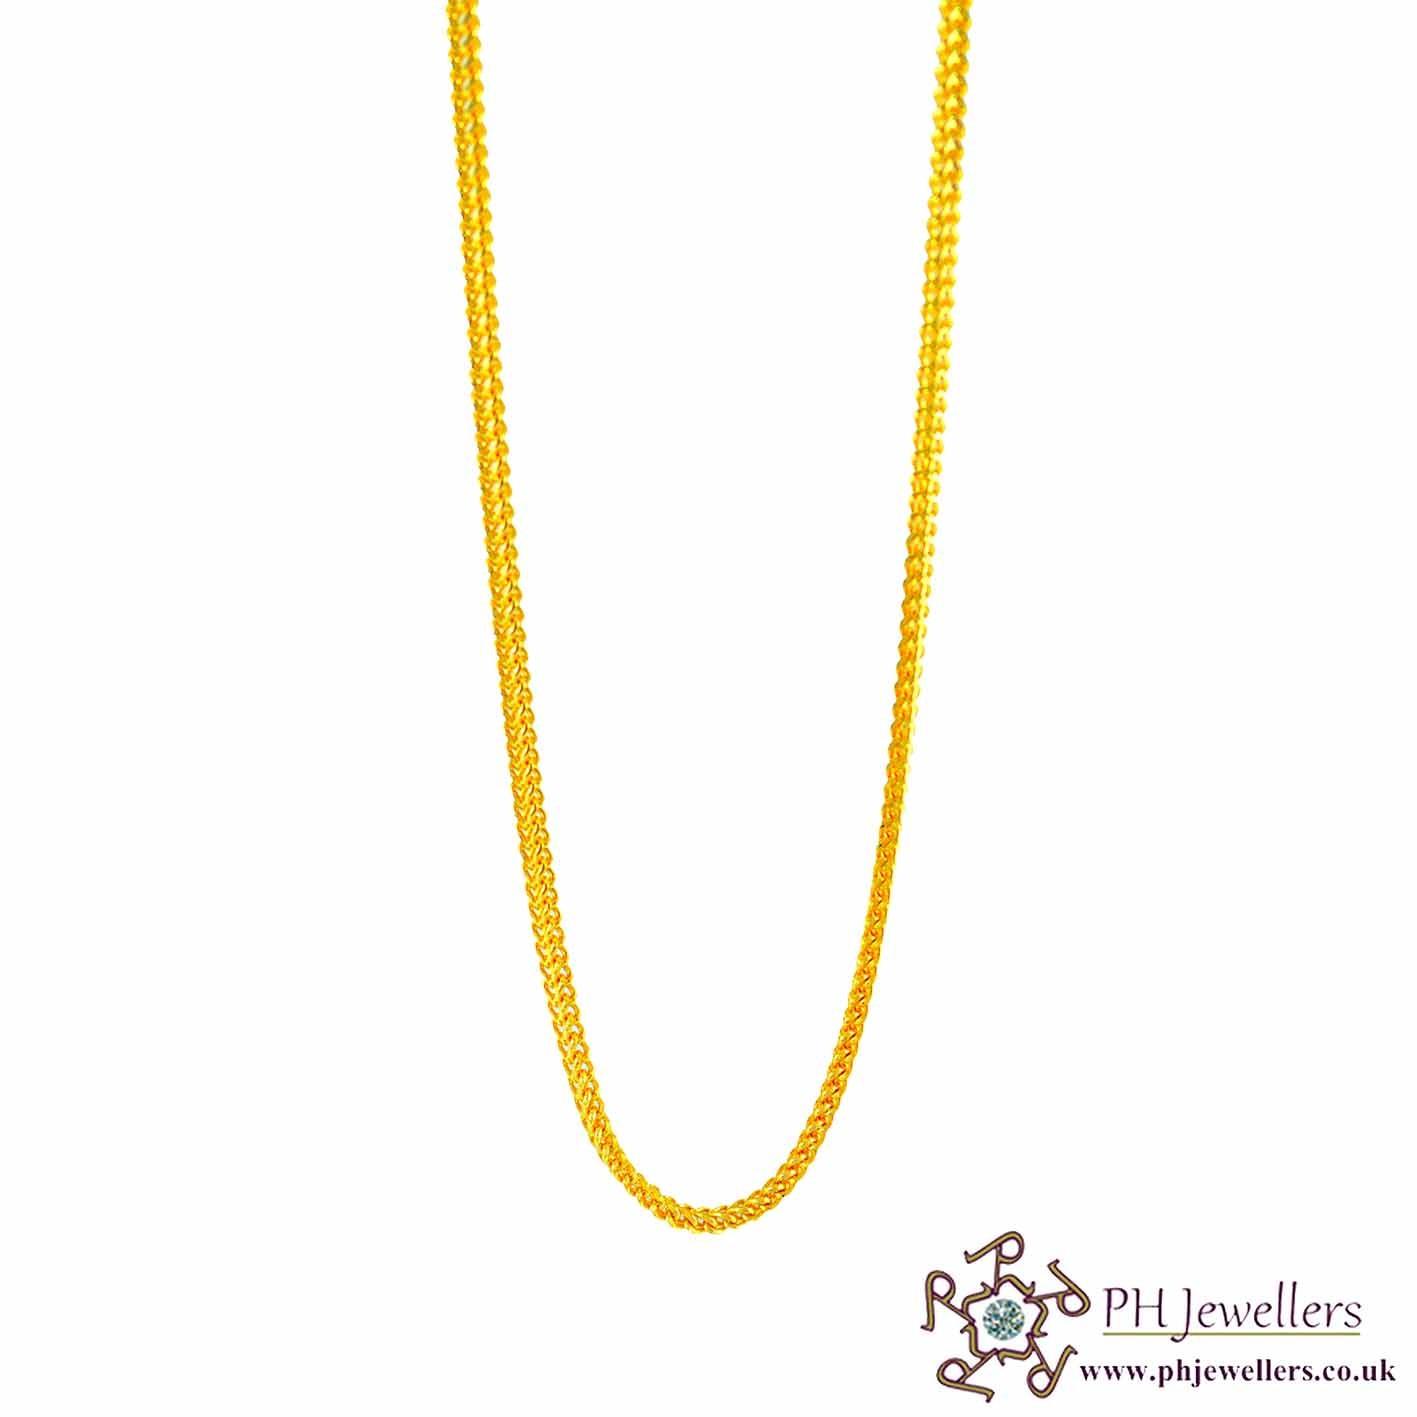 22ct 916 Hallmark Yellow Gold V Fox Chain PC13